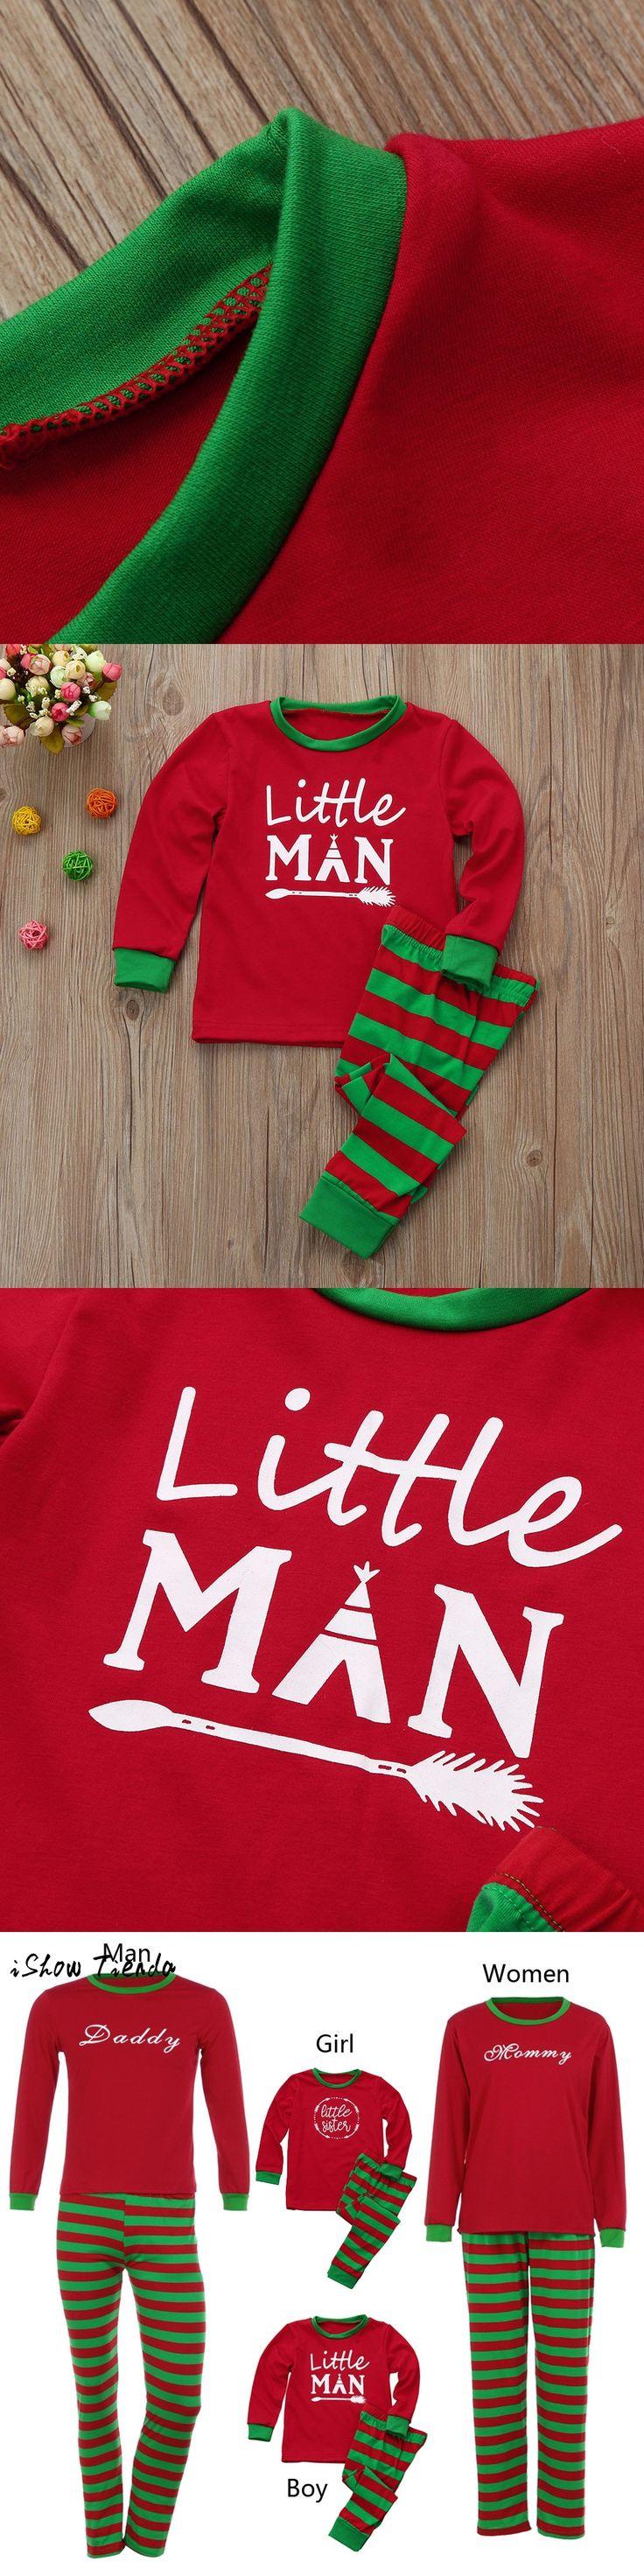 Women&Kid Boy Family PJS Christmas new year costume Pajamas Print Blouse long sleeve top+Santa Pant Striped Outfit Clothing Set